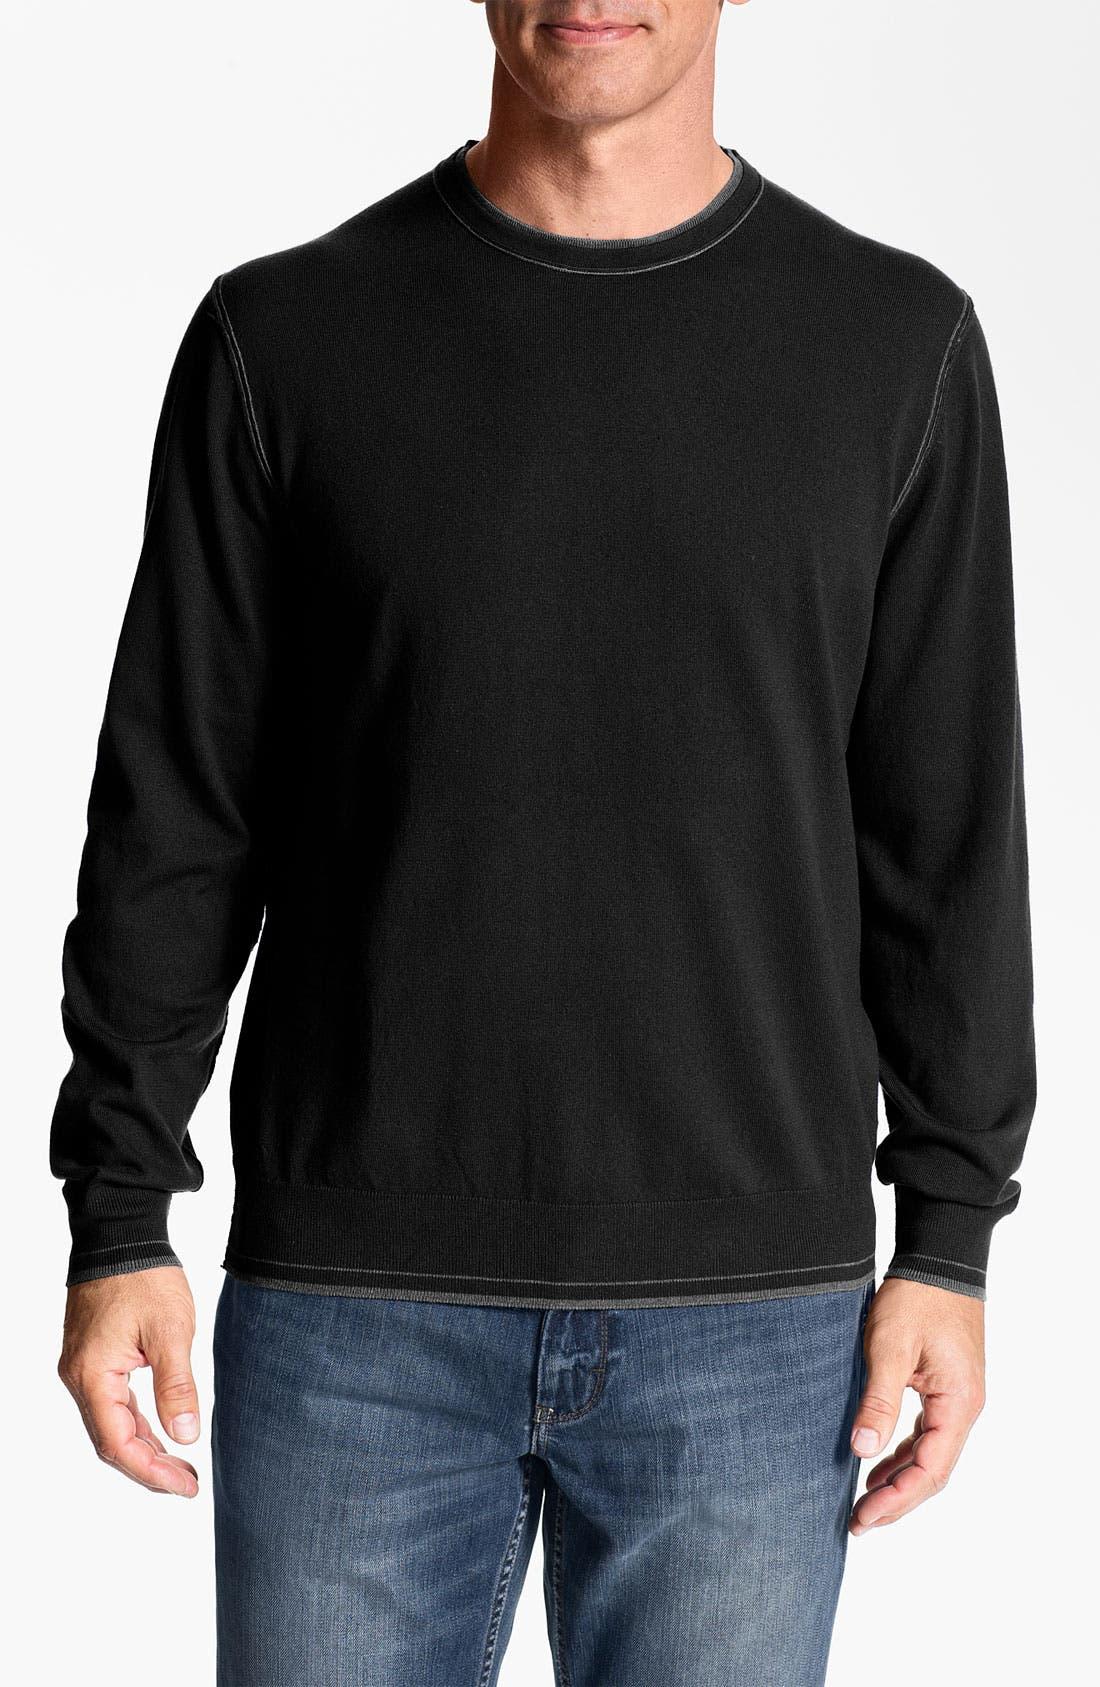 Main Image - Tommy Bahama 'Johnny Cashmere' Crewneck Cashmere Blend Sweater